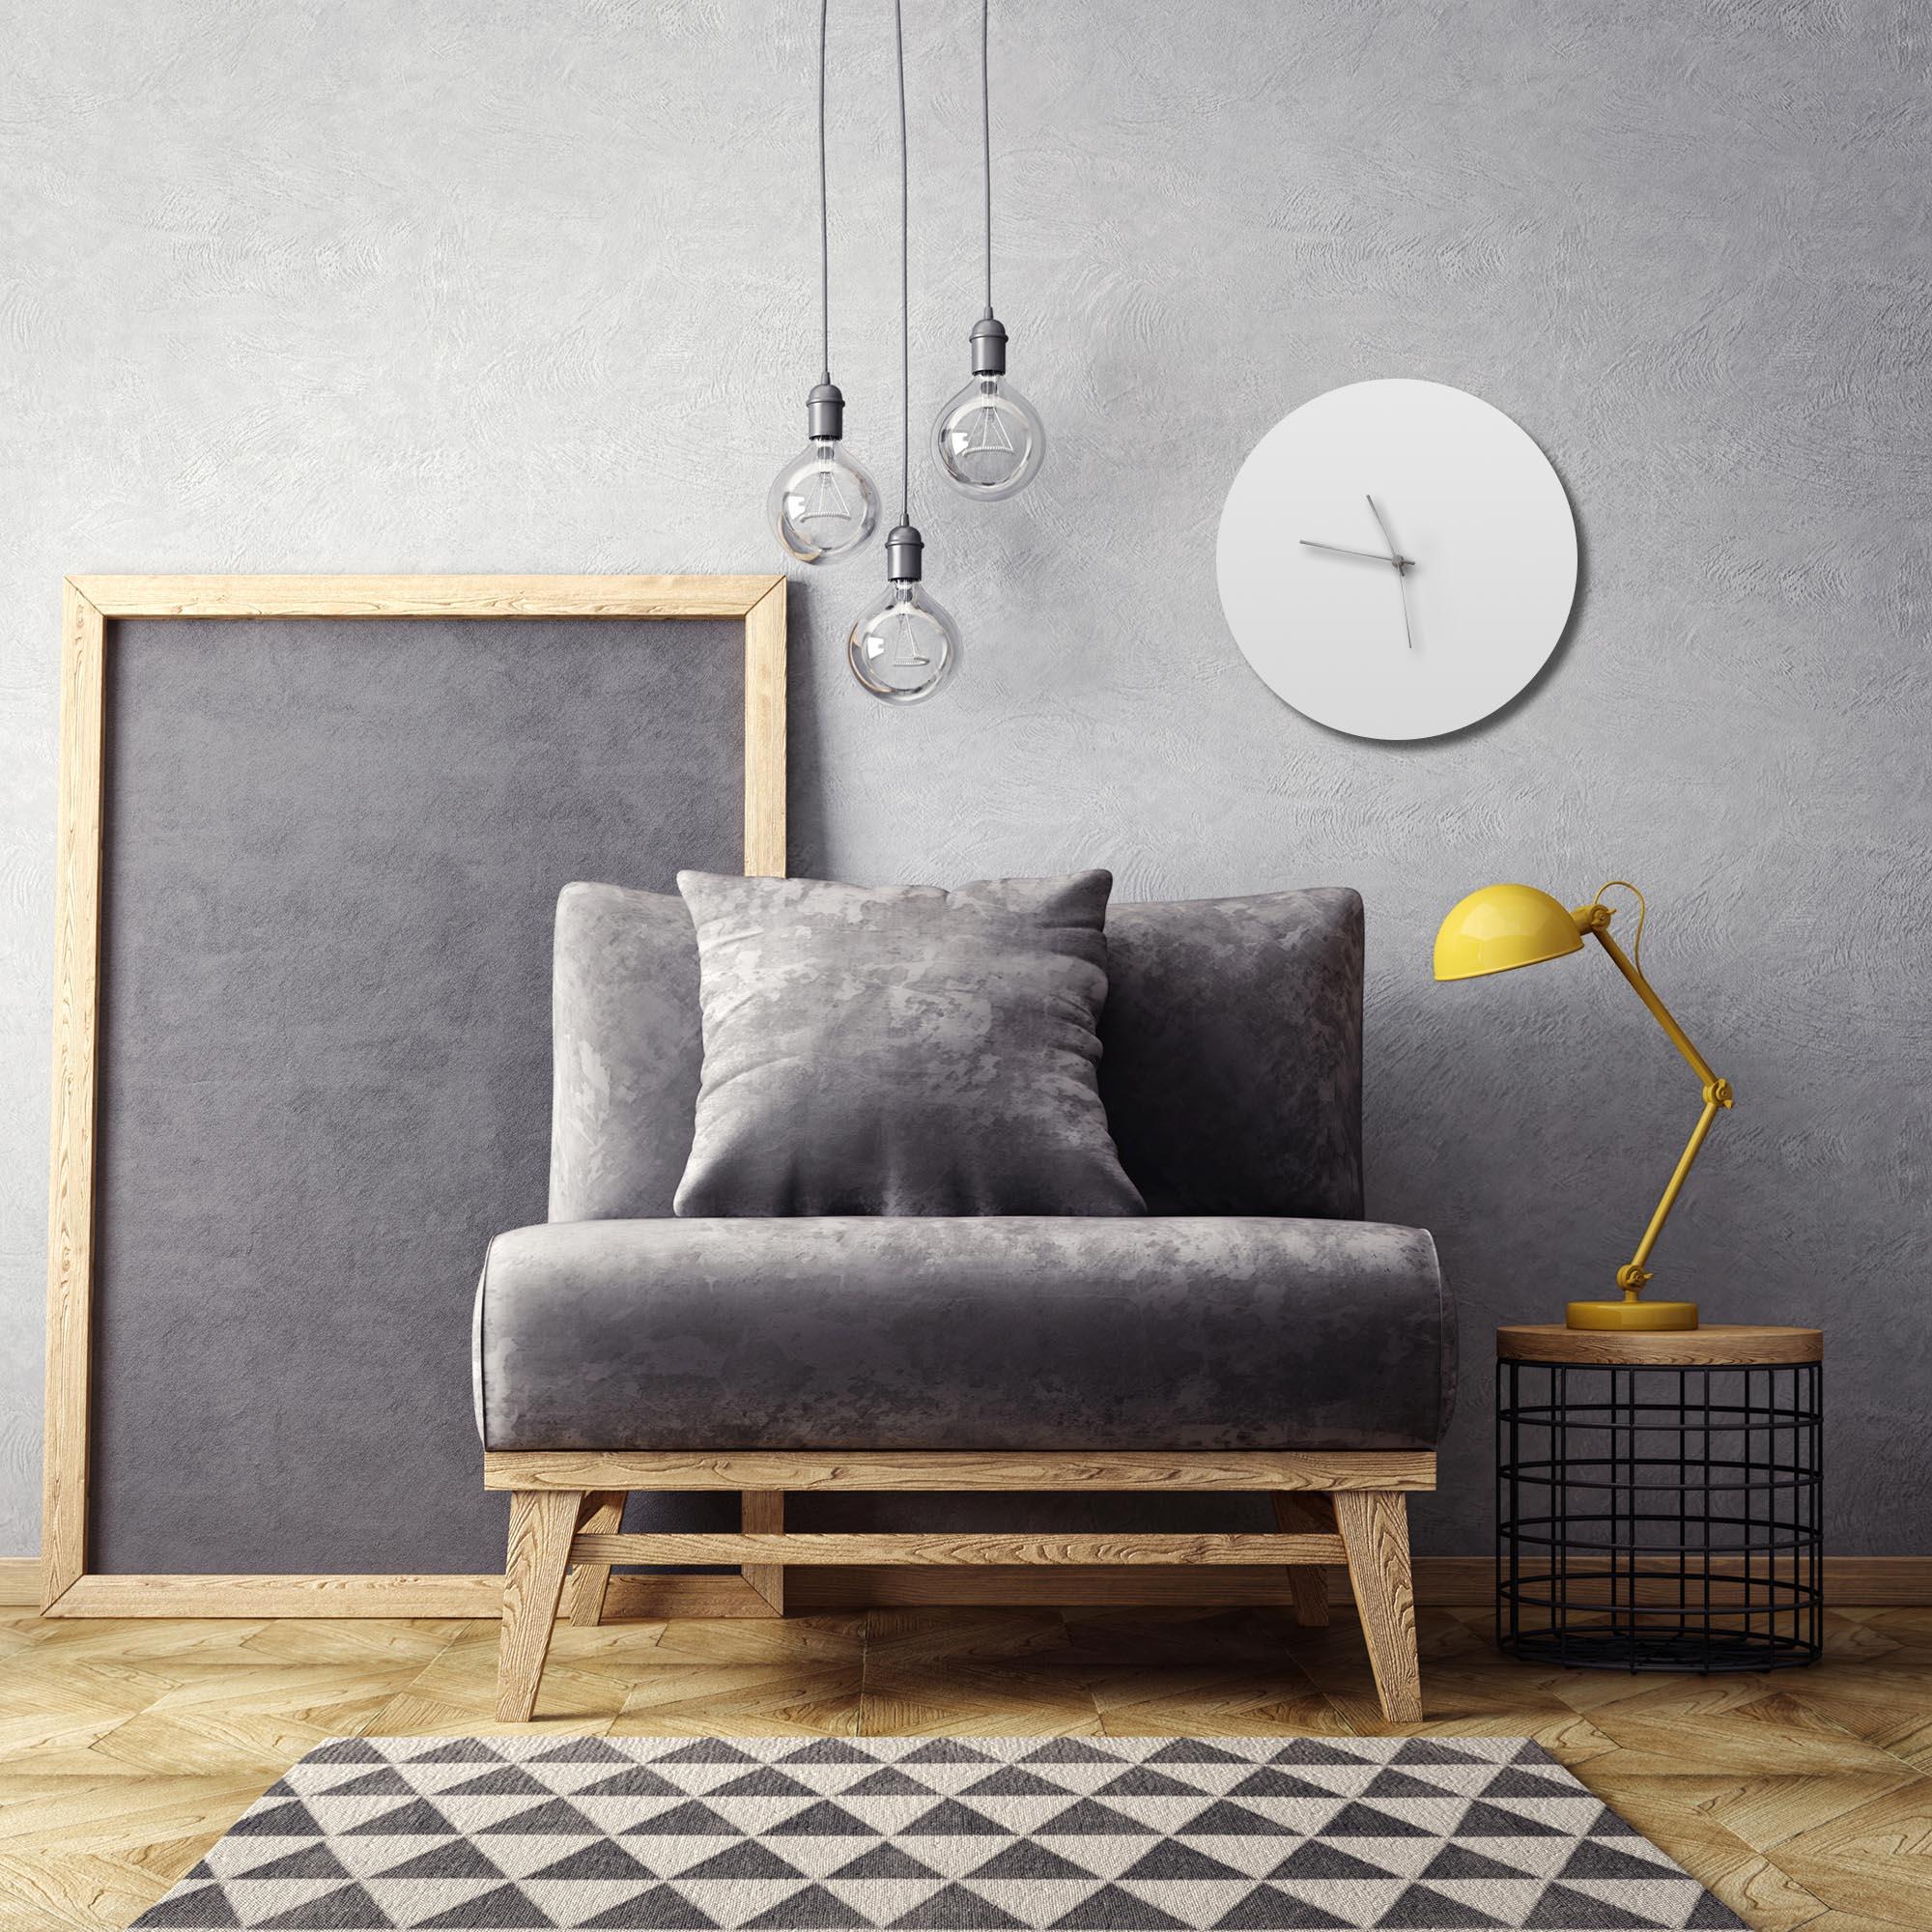 Whiteout Silver Circle Clock - Lifestyle View